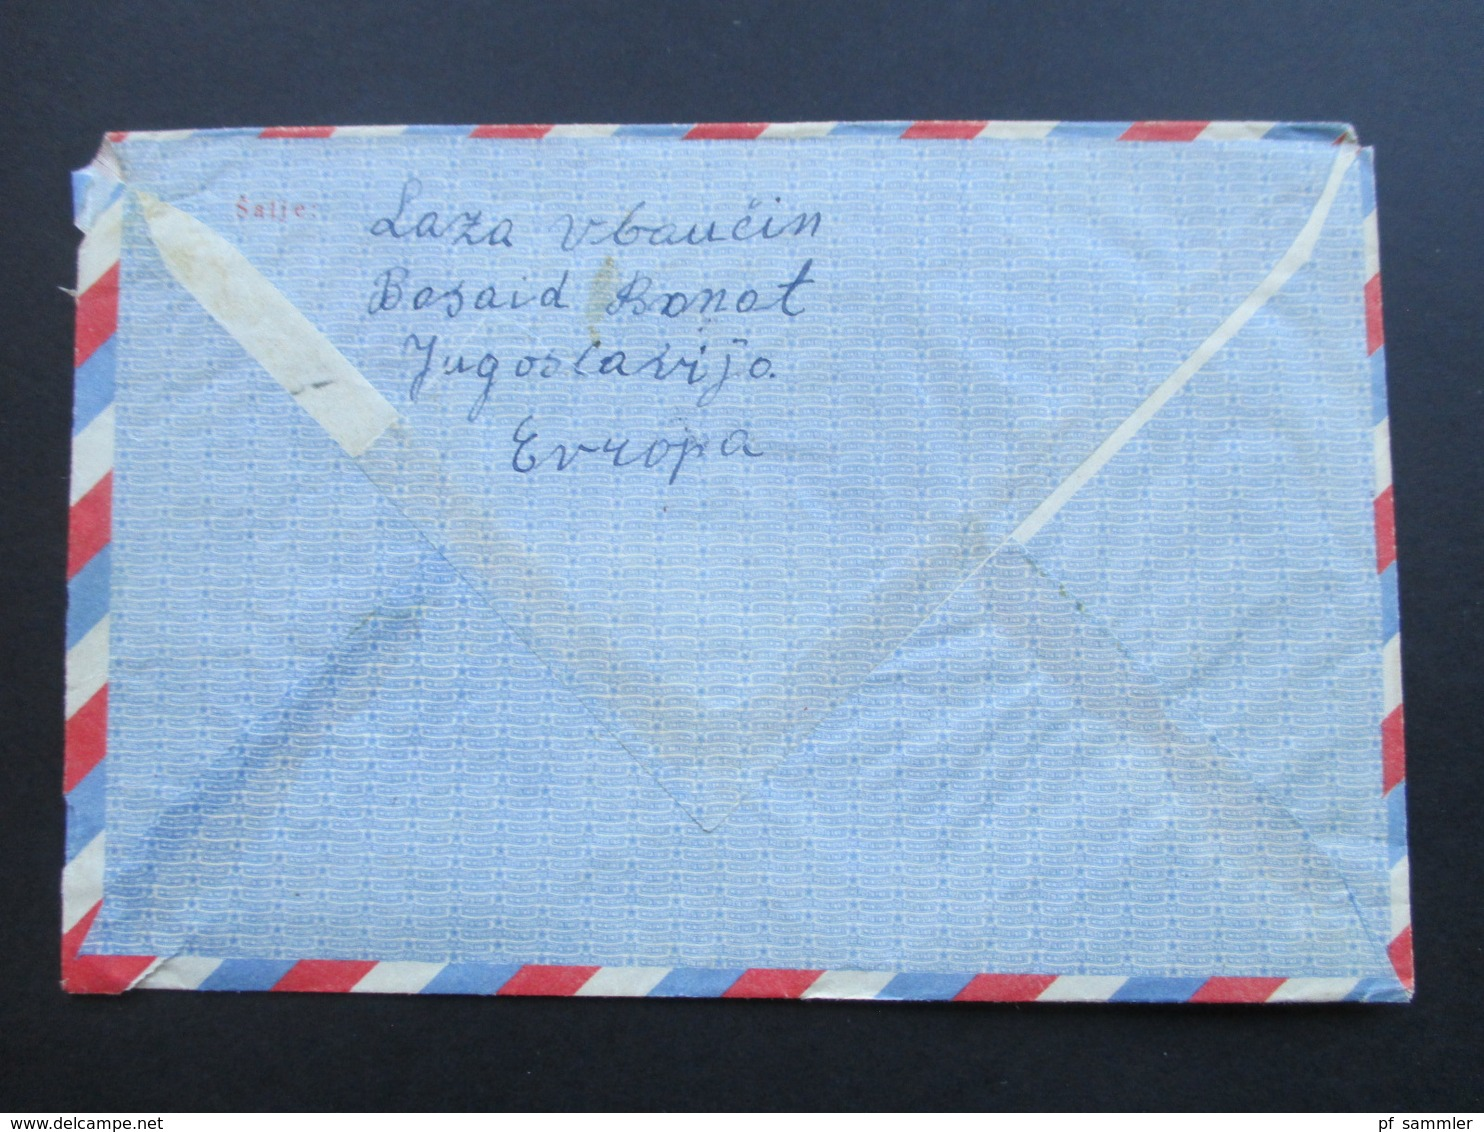 Jugoslawien 1948 / 49 Lufrpostfaltbrief LF 2 Mit 2 Zusatzfrankaturen Nach Detroit USA. - 1945-1992 République Fédérative Populaire De Yougoslavie